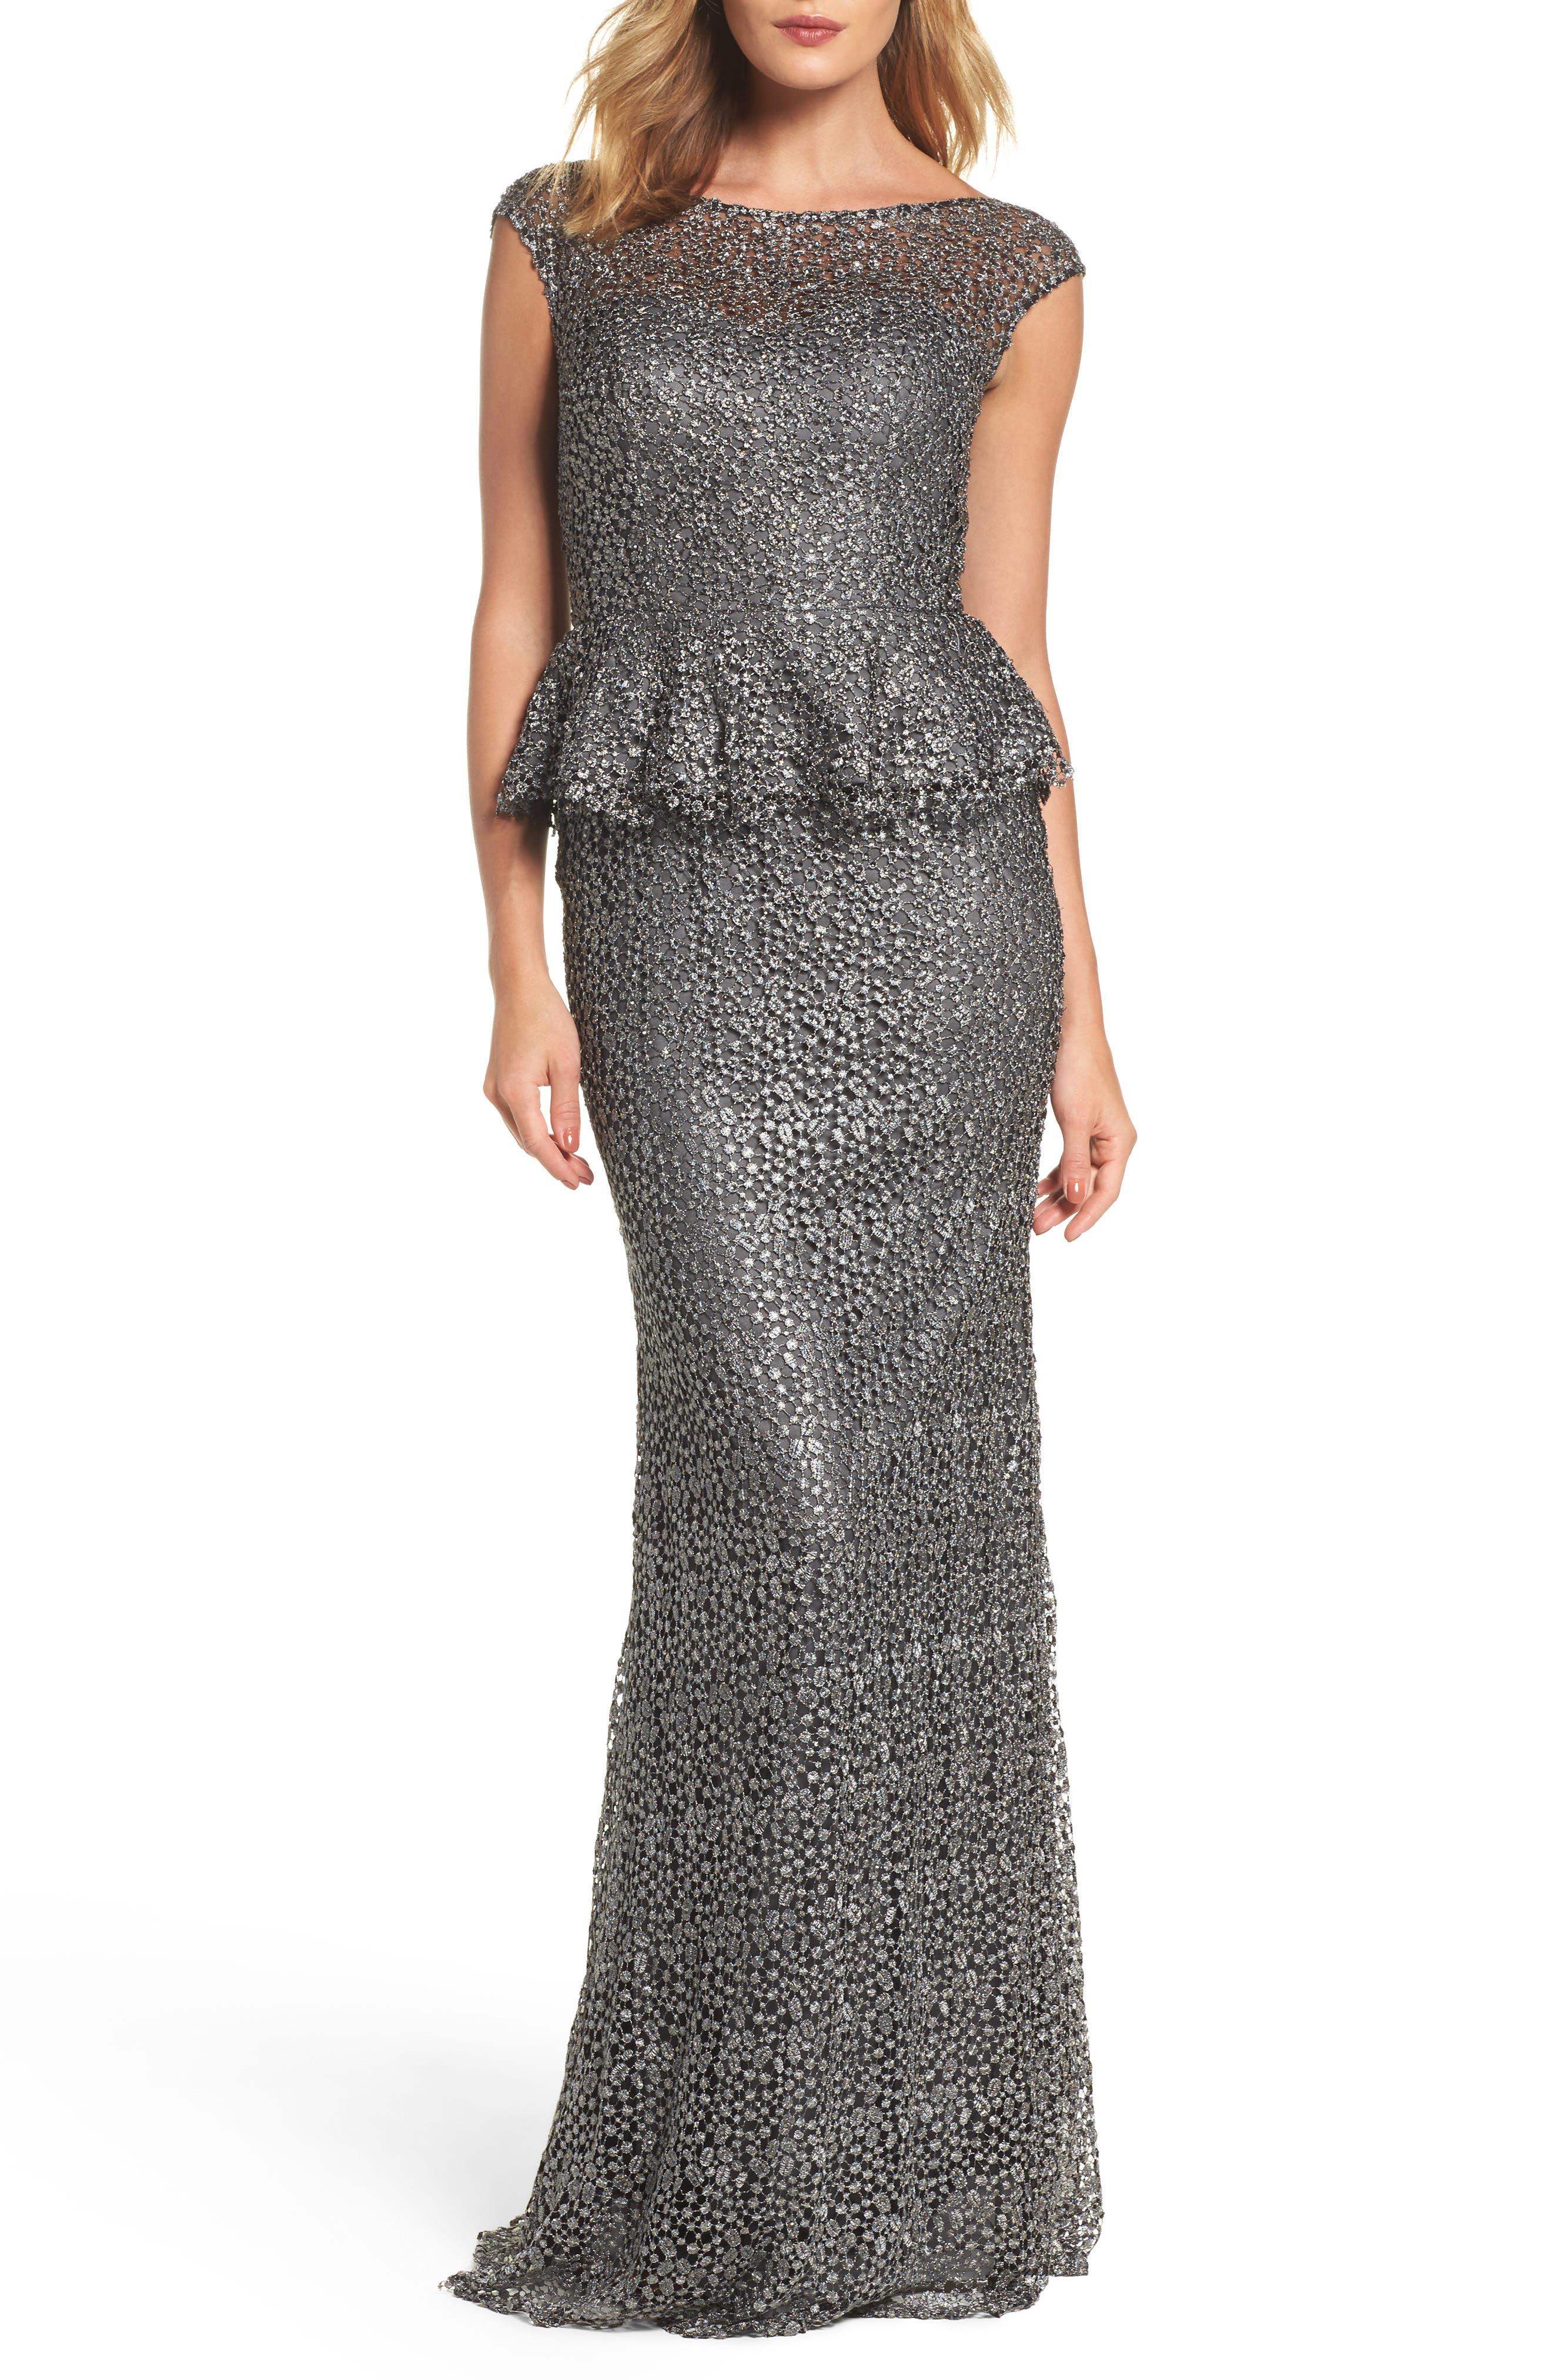 Main Image - La Femme Embellished Lace Peplum Gown